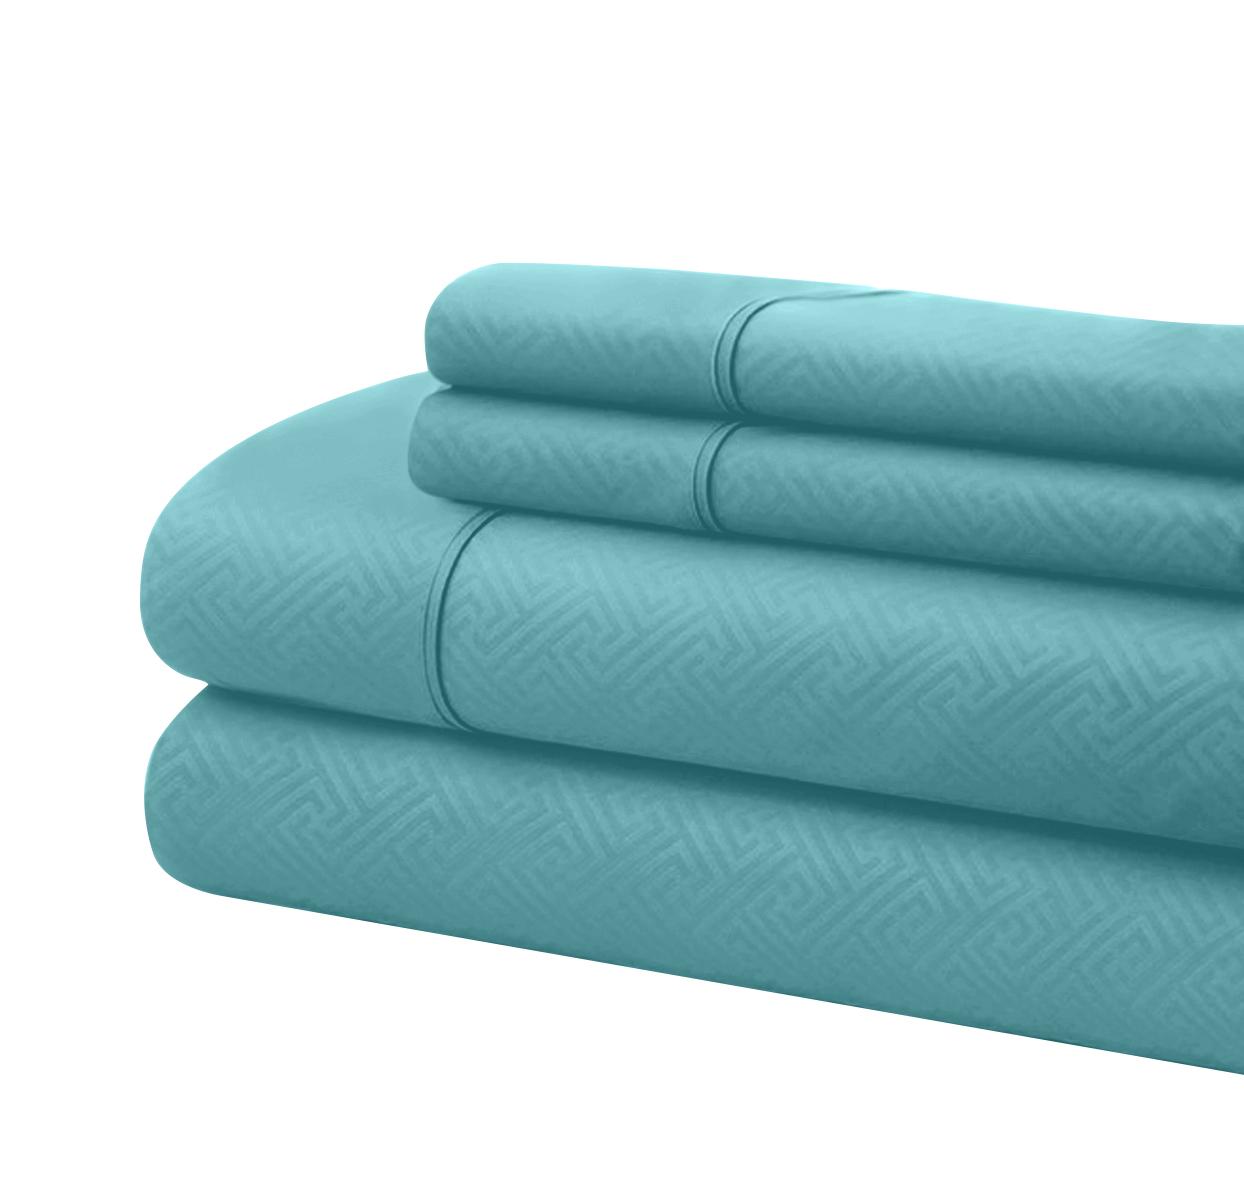 Bassano 1800 Series Embossed Deep Pocket Sheet Set - Super Soft & Wrinkle Free - Luxurious Bed Sheets Set (California King, Aqua)